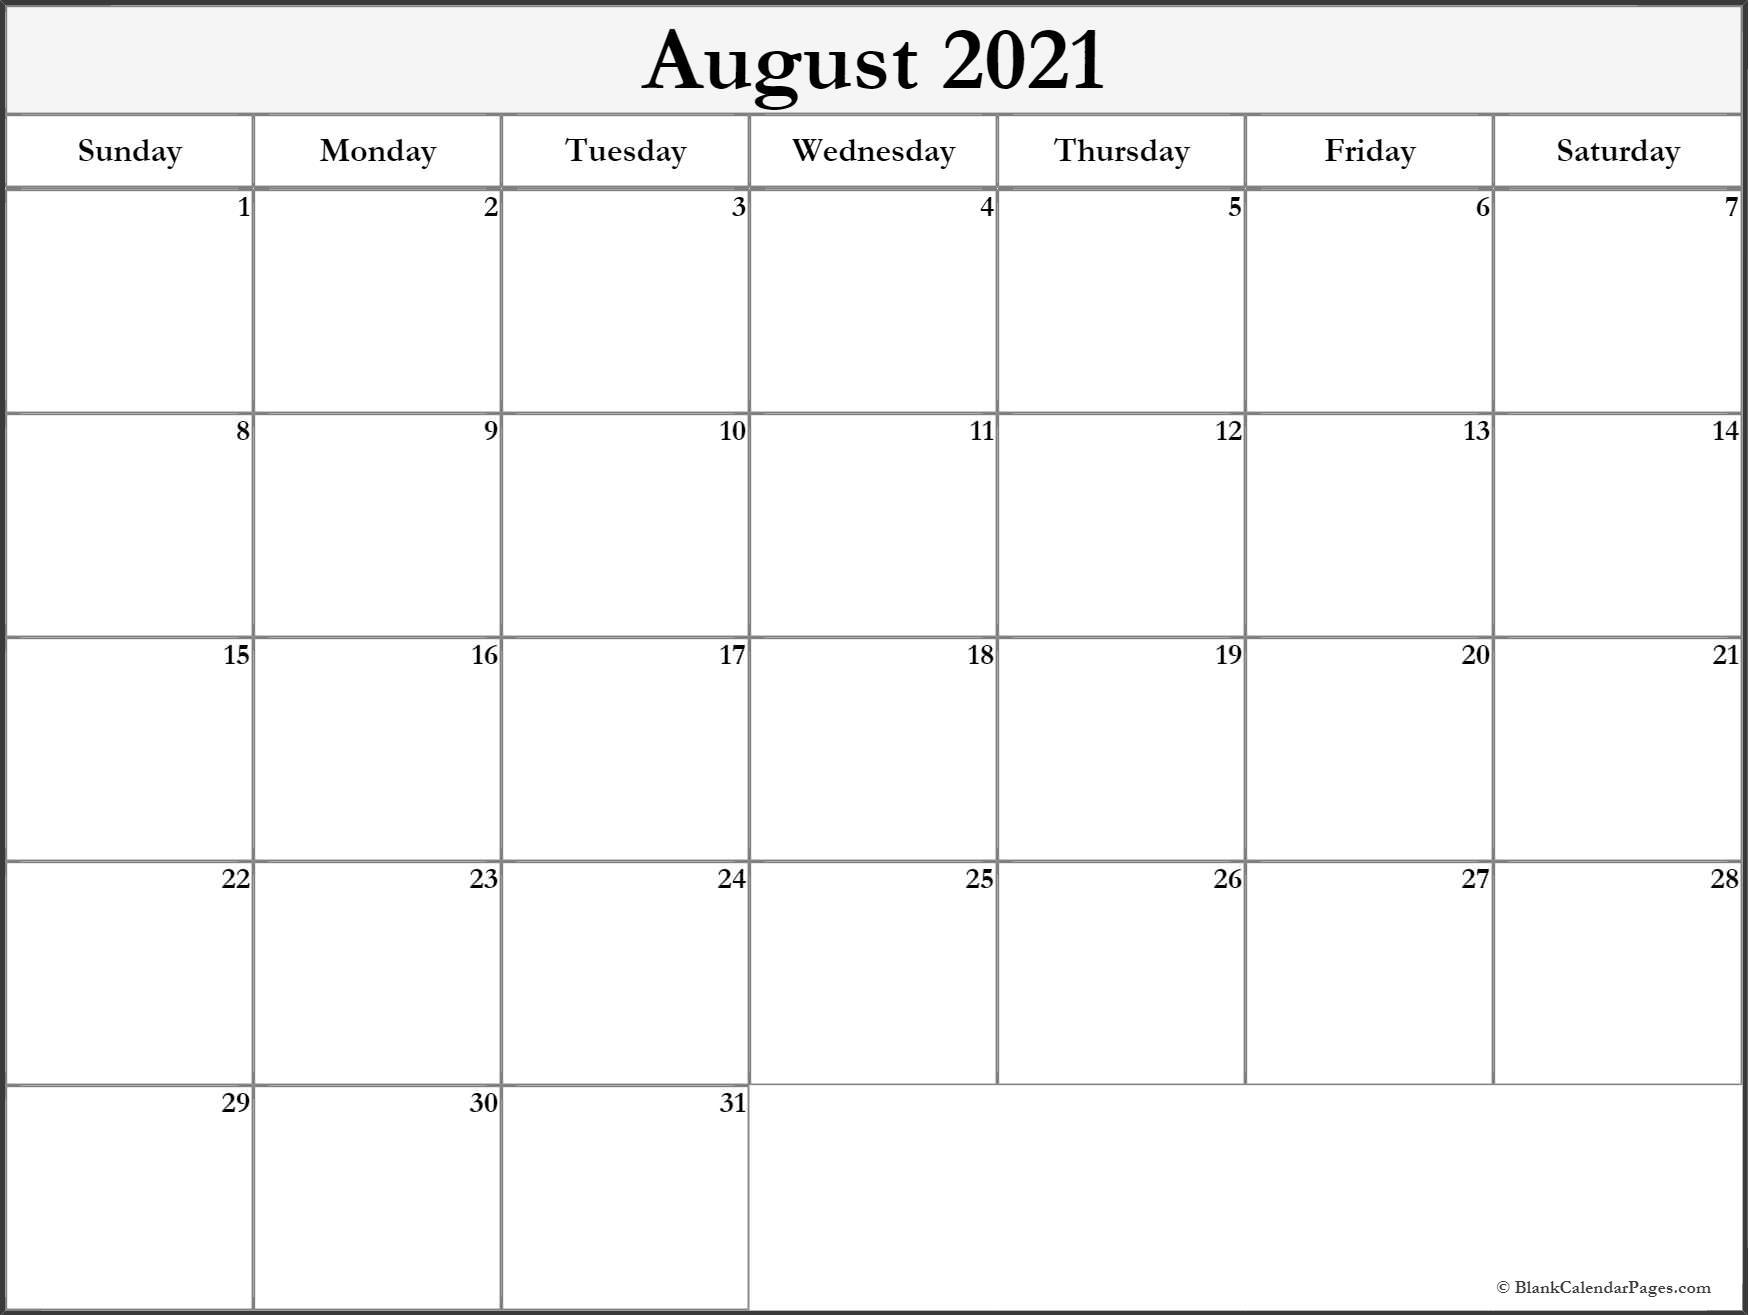 August 2021 Blank Calendar Templates 1